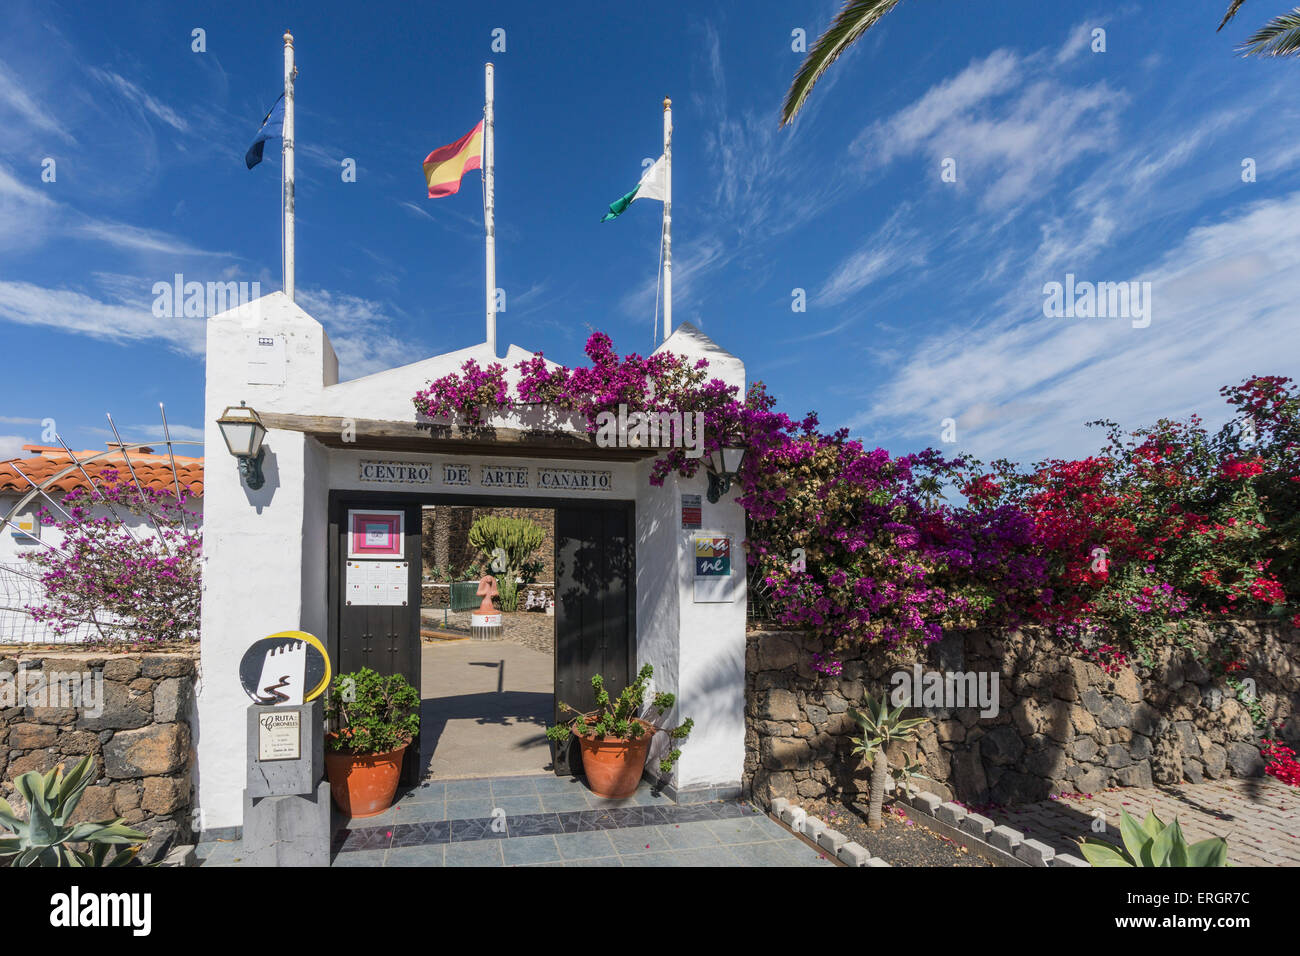 Centro de Arte Canario, Kunstmuseum, La Oliva, Fuerteventura, Kanarische Inseln, Spanien Stockbild